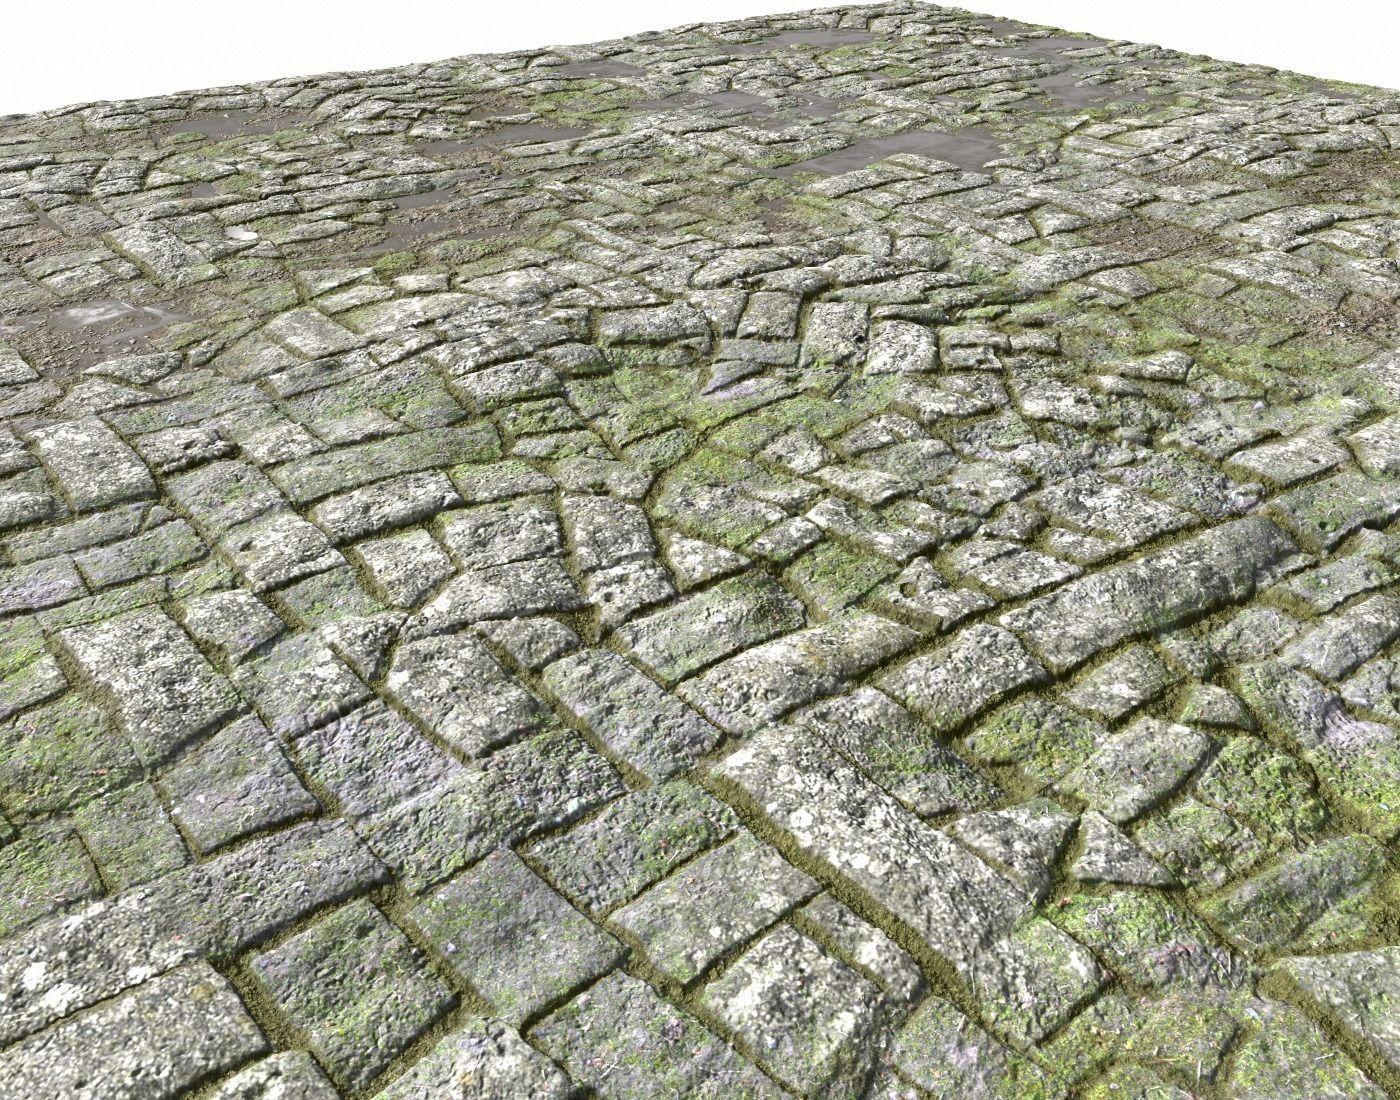 Old Mossy Floor Seamless PBR